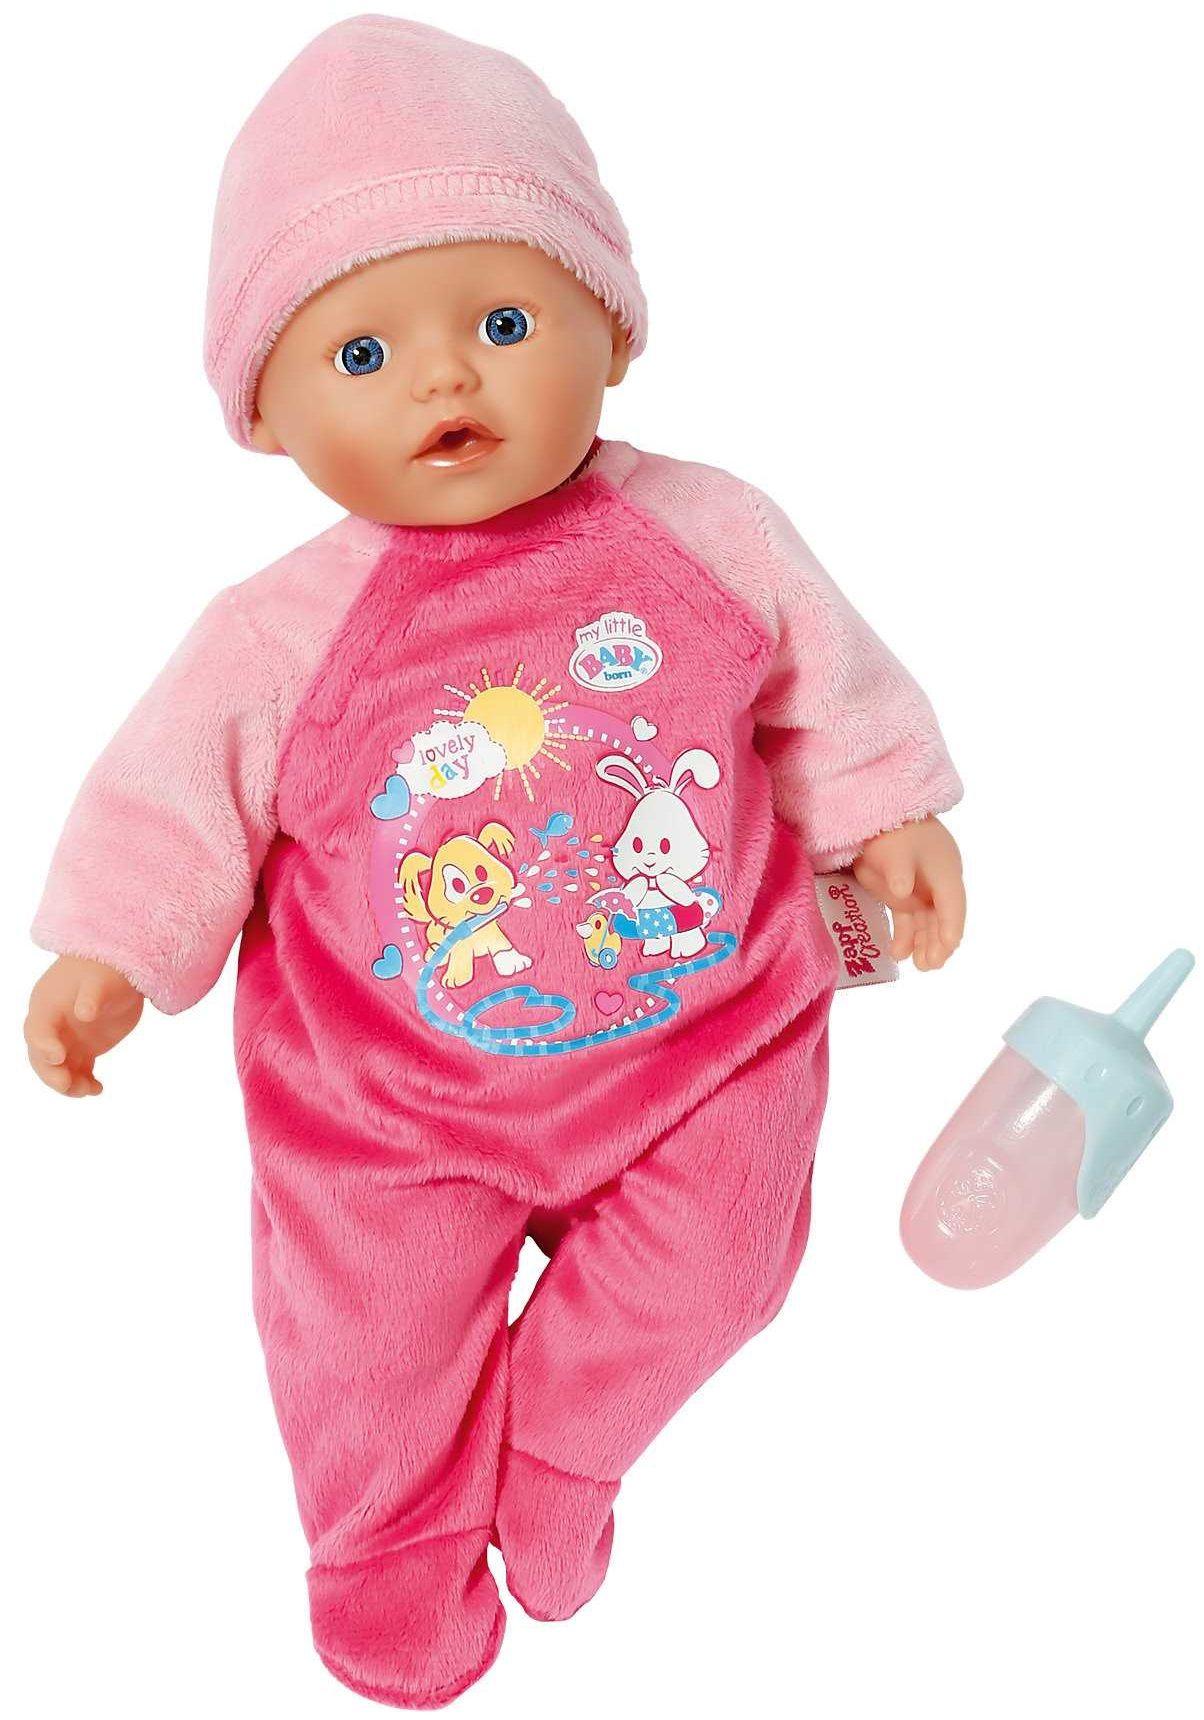 элементы картинки всех кукол беби бон домашние